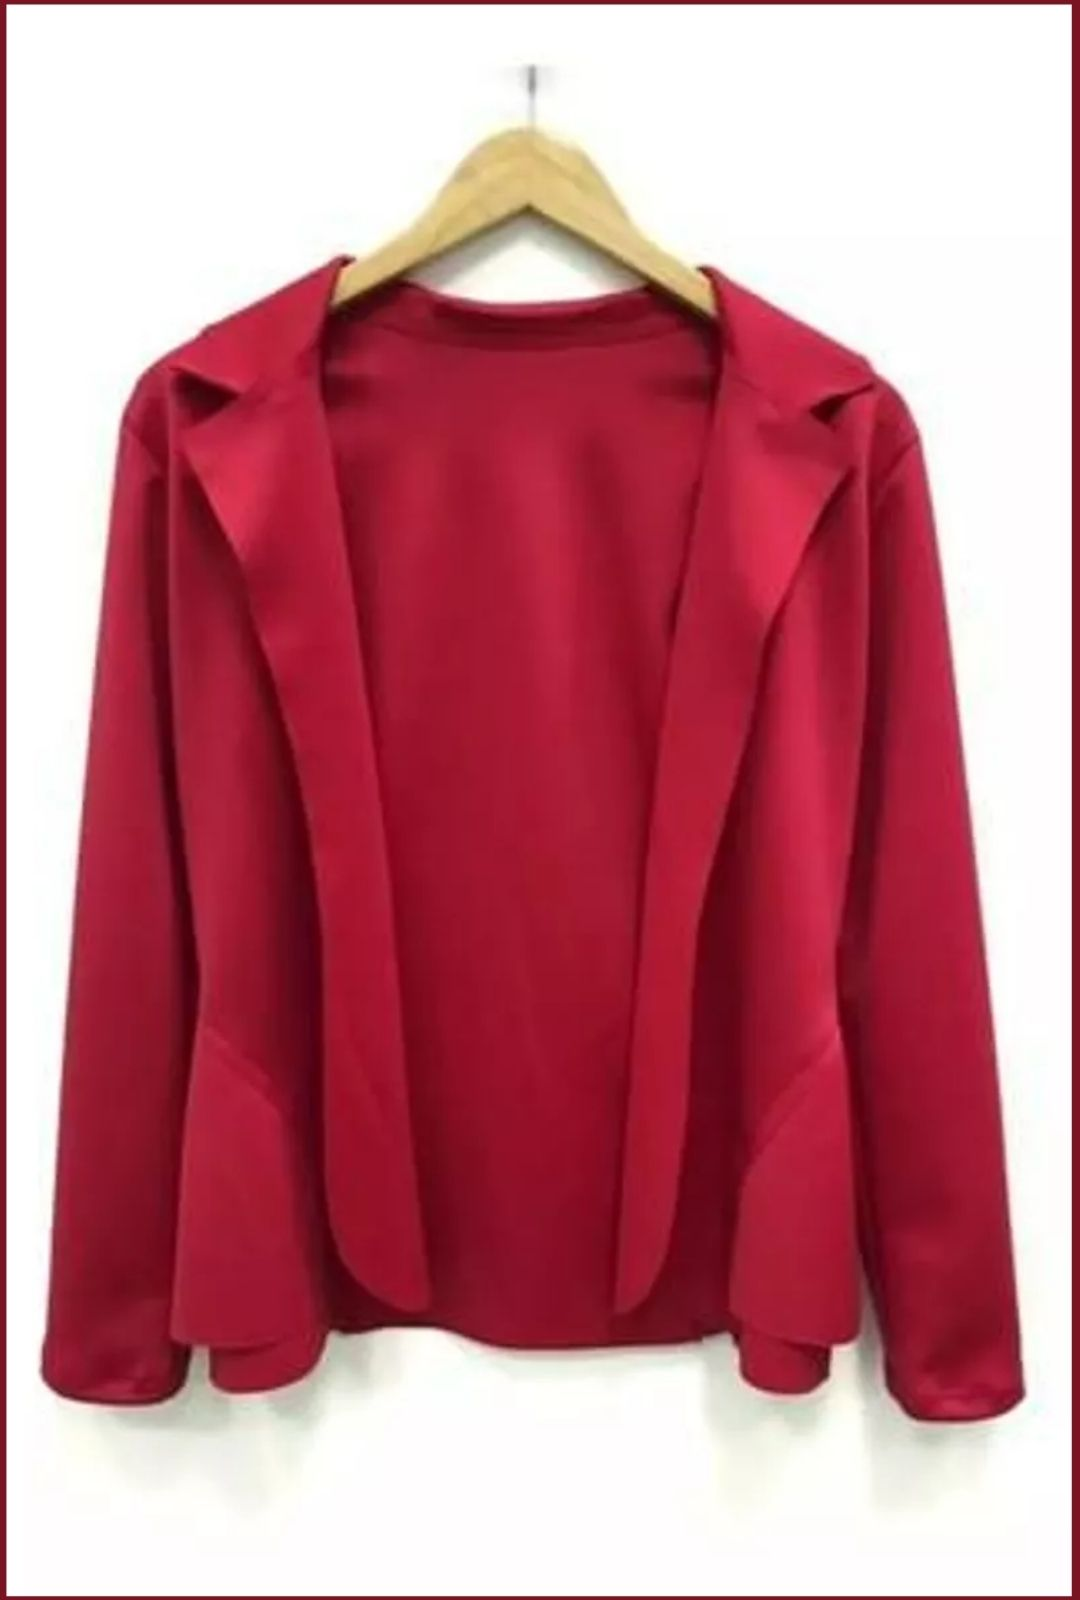 Blazer Casaquinho Neoprene Feminino Terninho Vermelho  - ModaStore | Moda Feminina